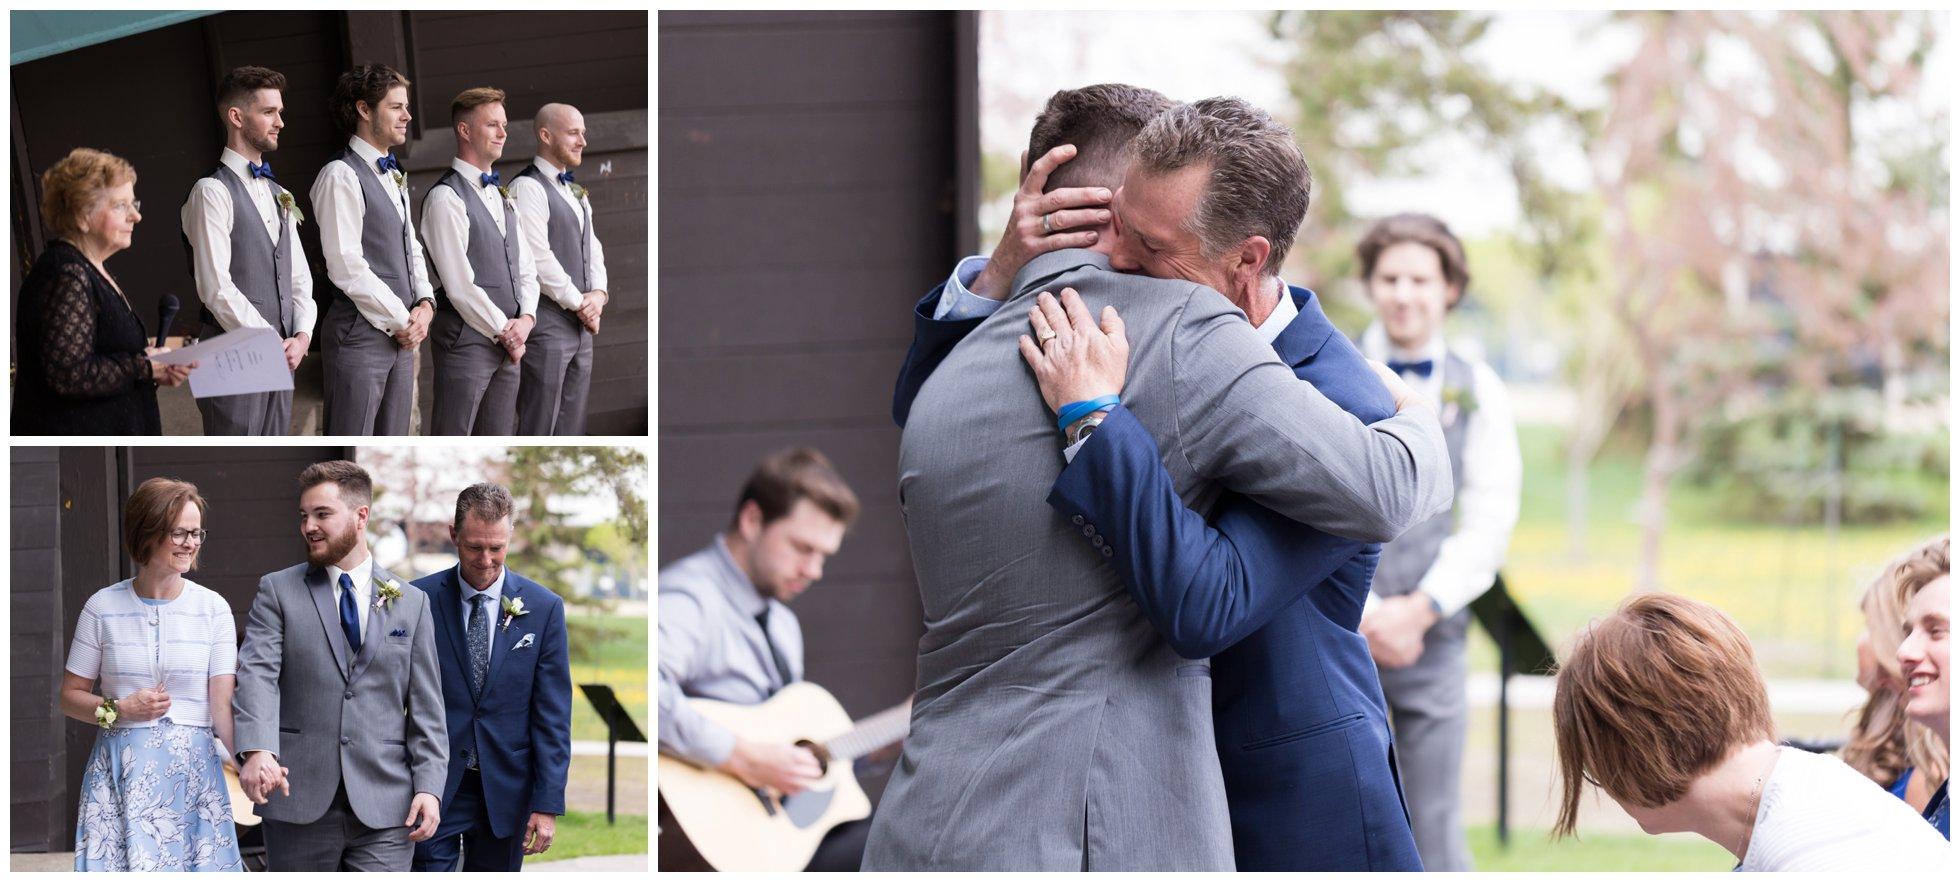 Emily and Royden Edmonton Wedding (Life by Selena Photography)_0002.jpg